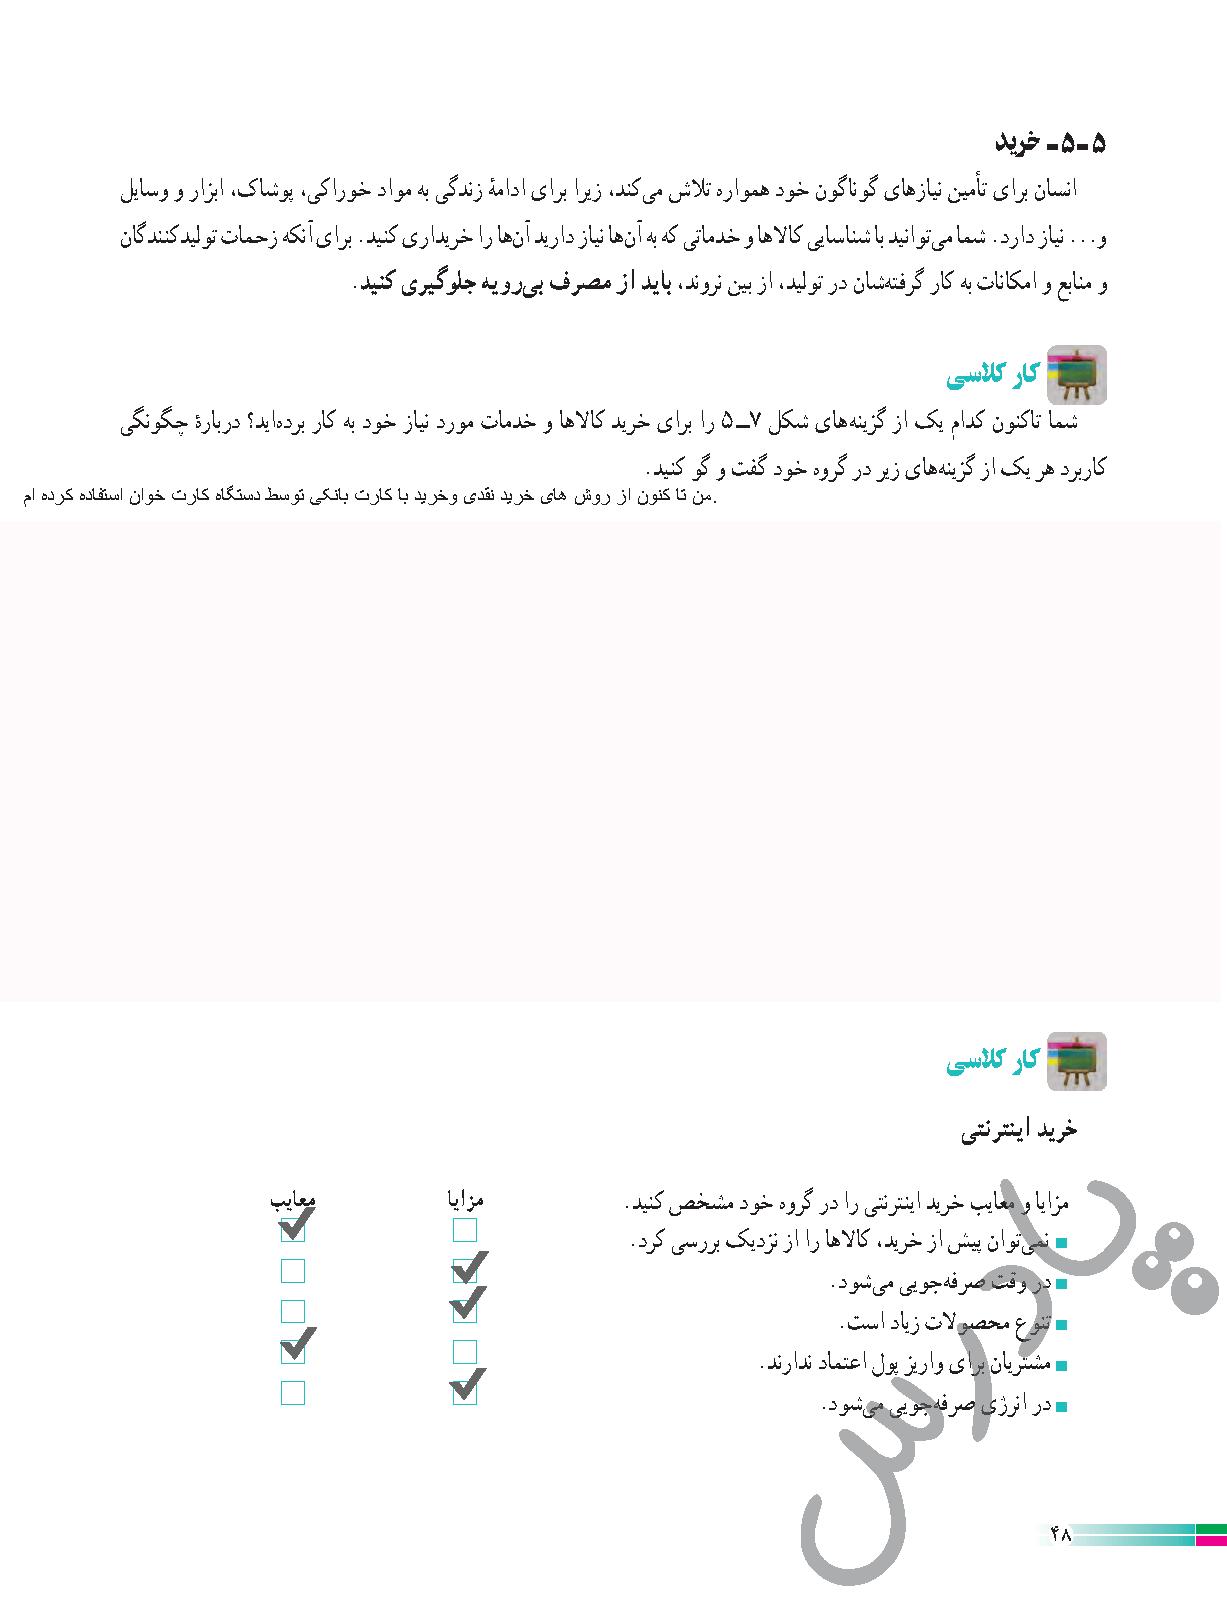 جواب کاردرکلاس صفحه 48 کاوفناوری هفتم